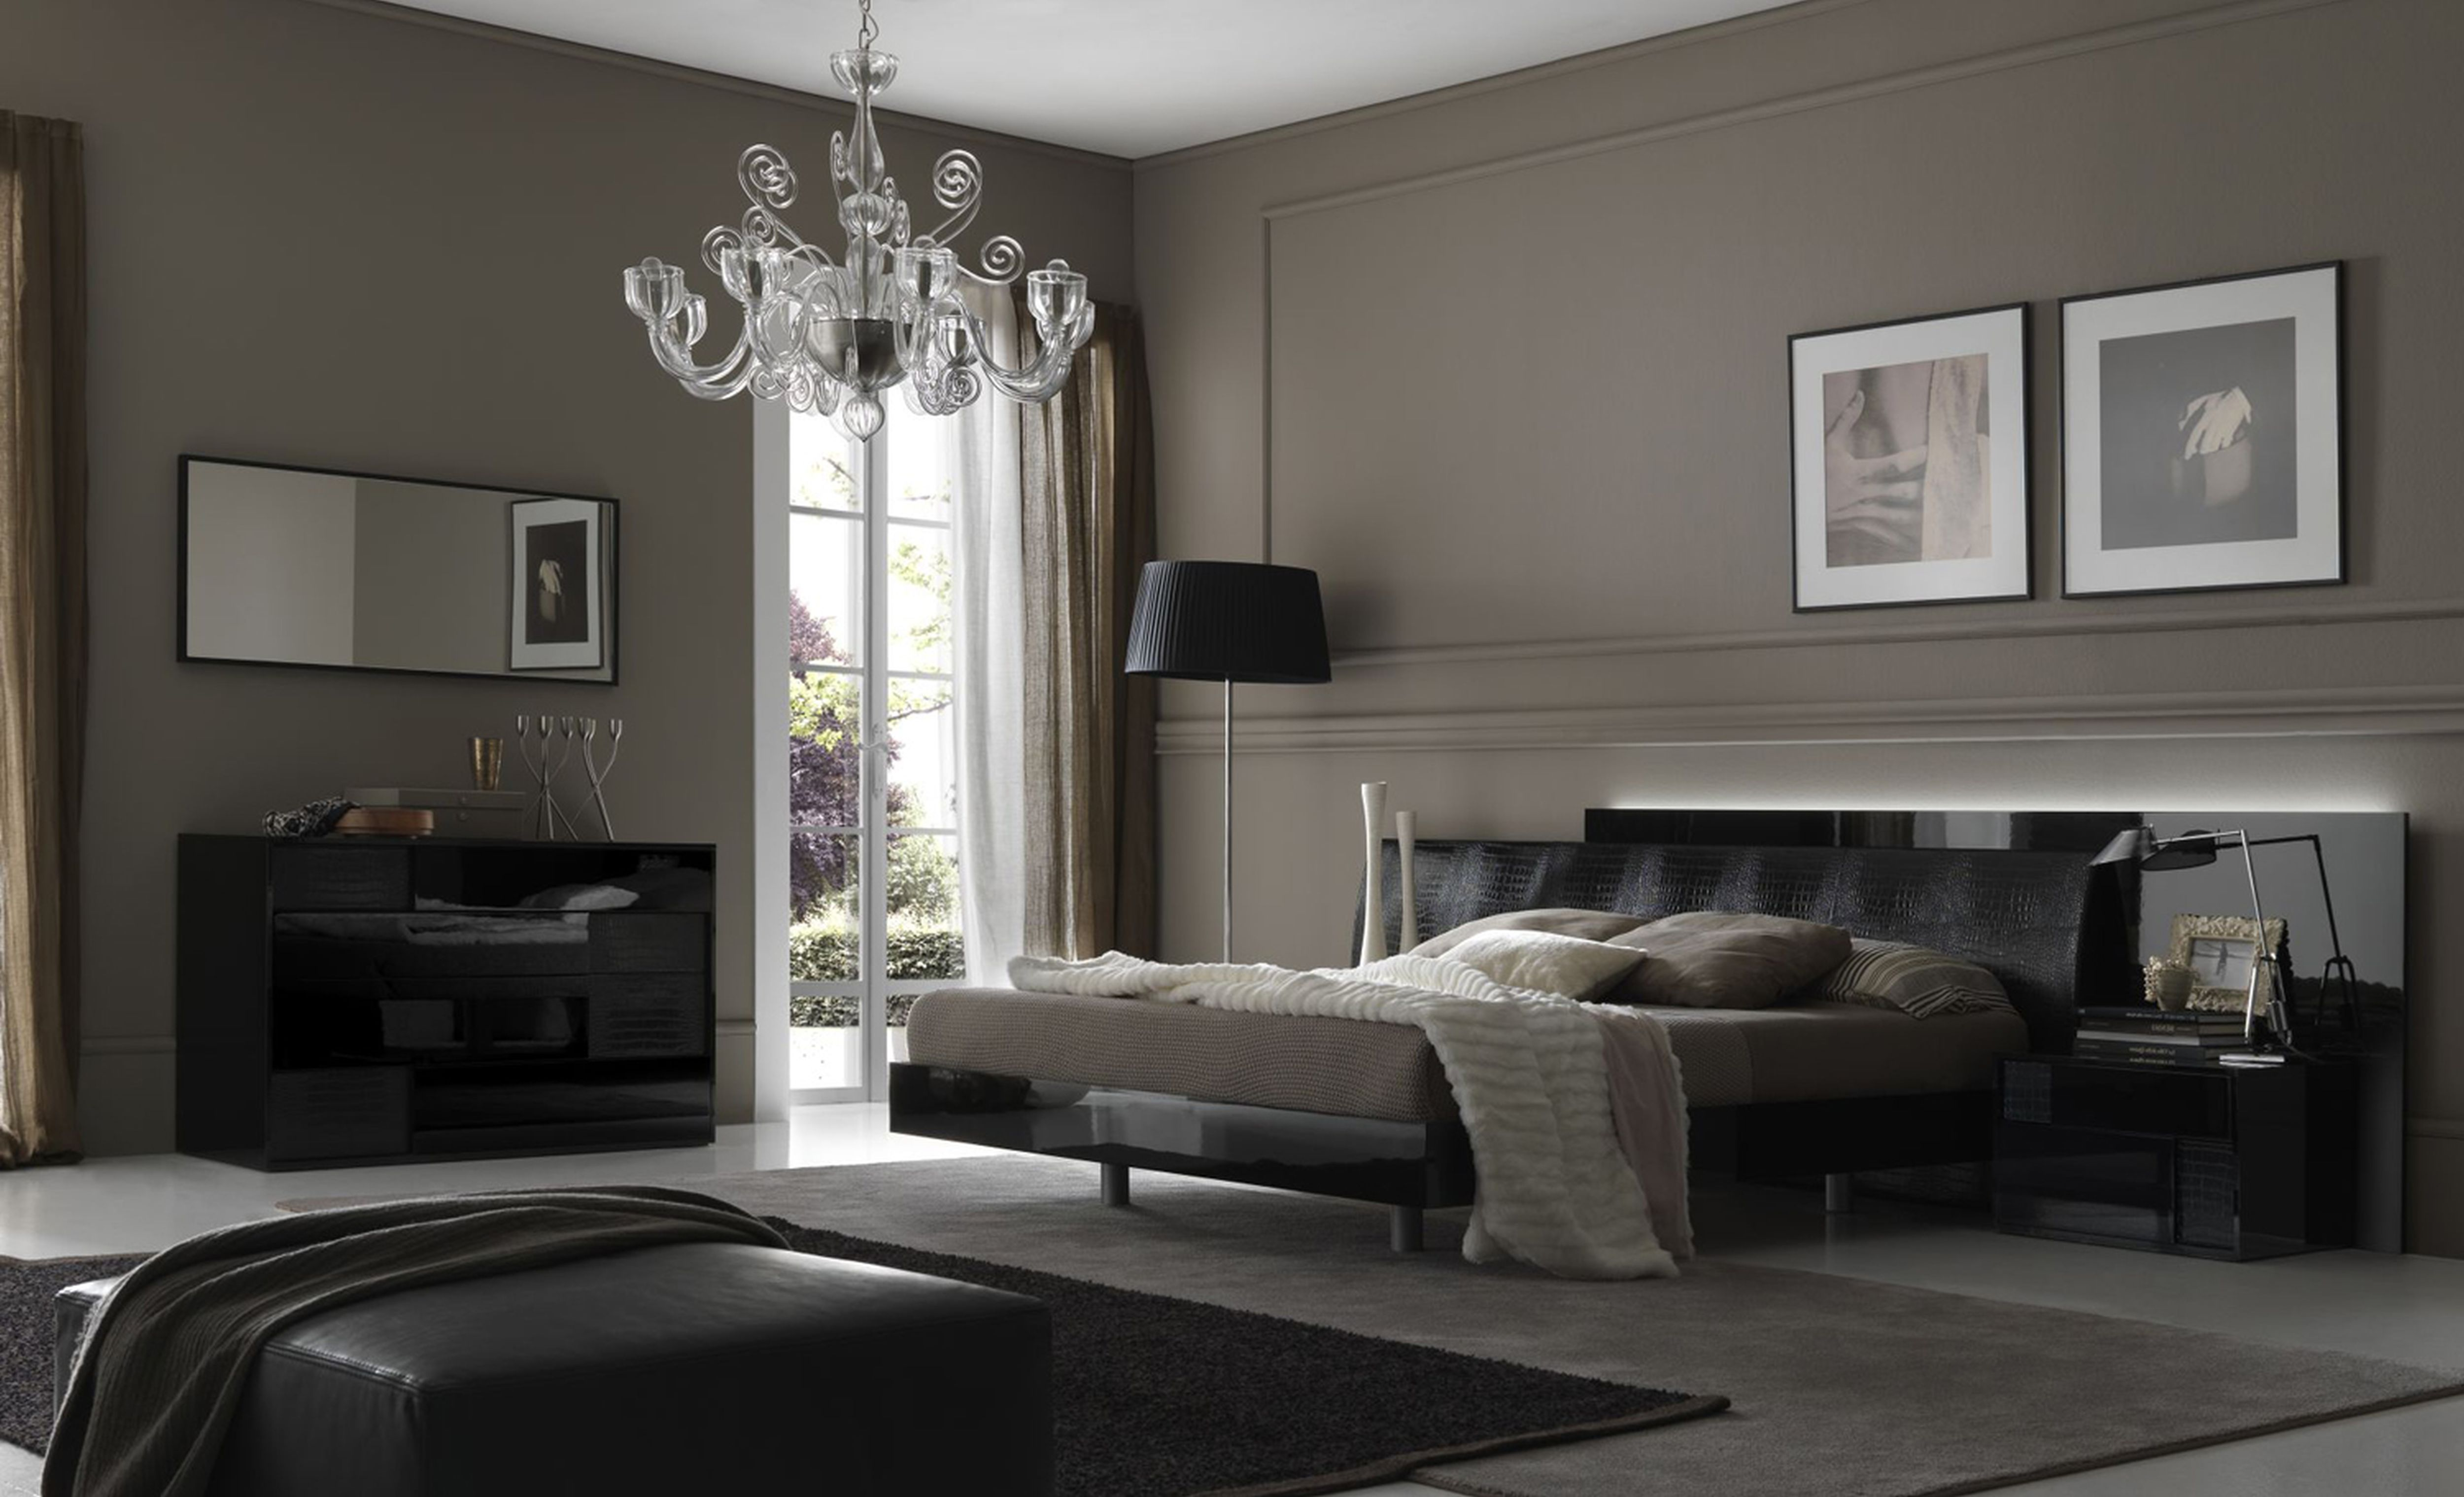 ideas interior decorating ideas home interior design ideas modern 5000x3037